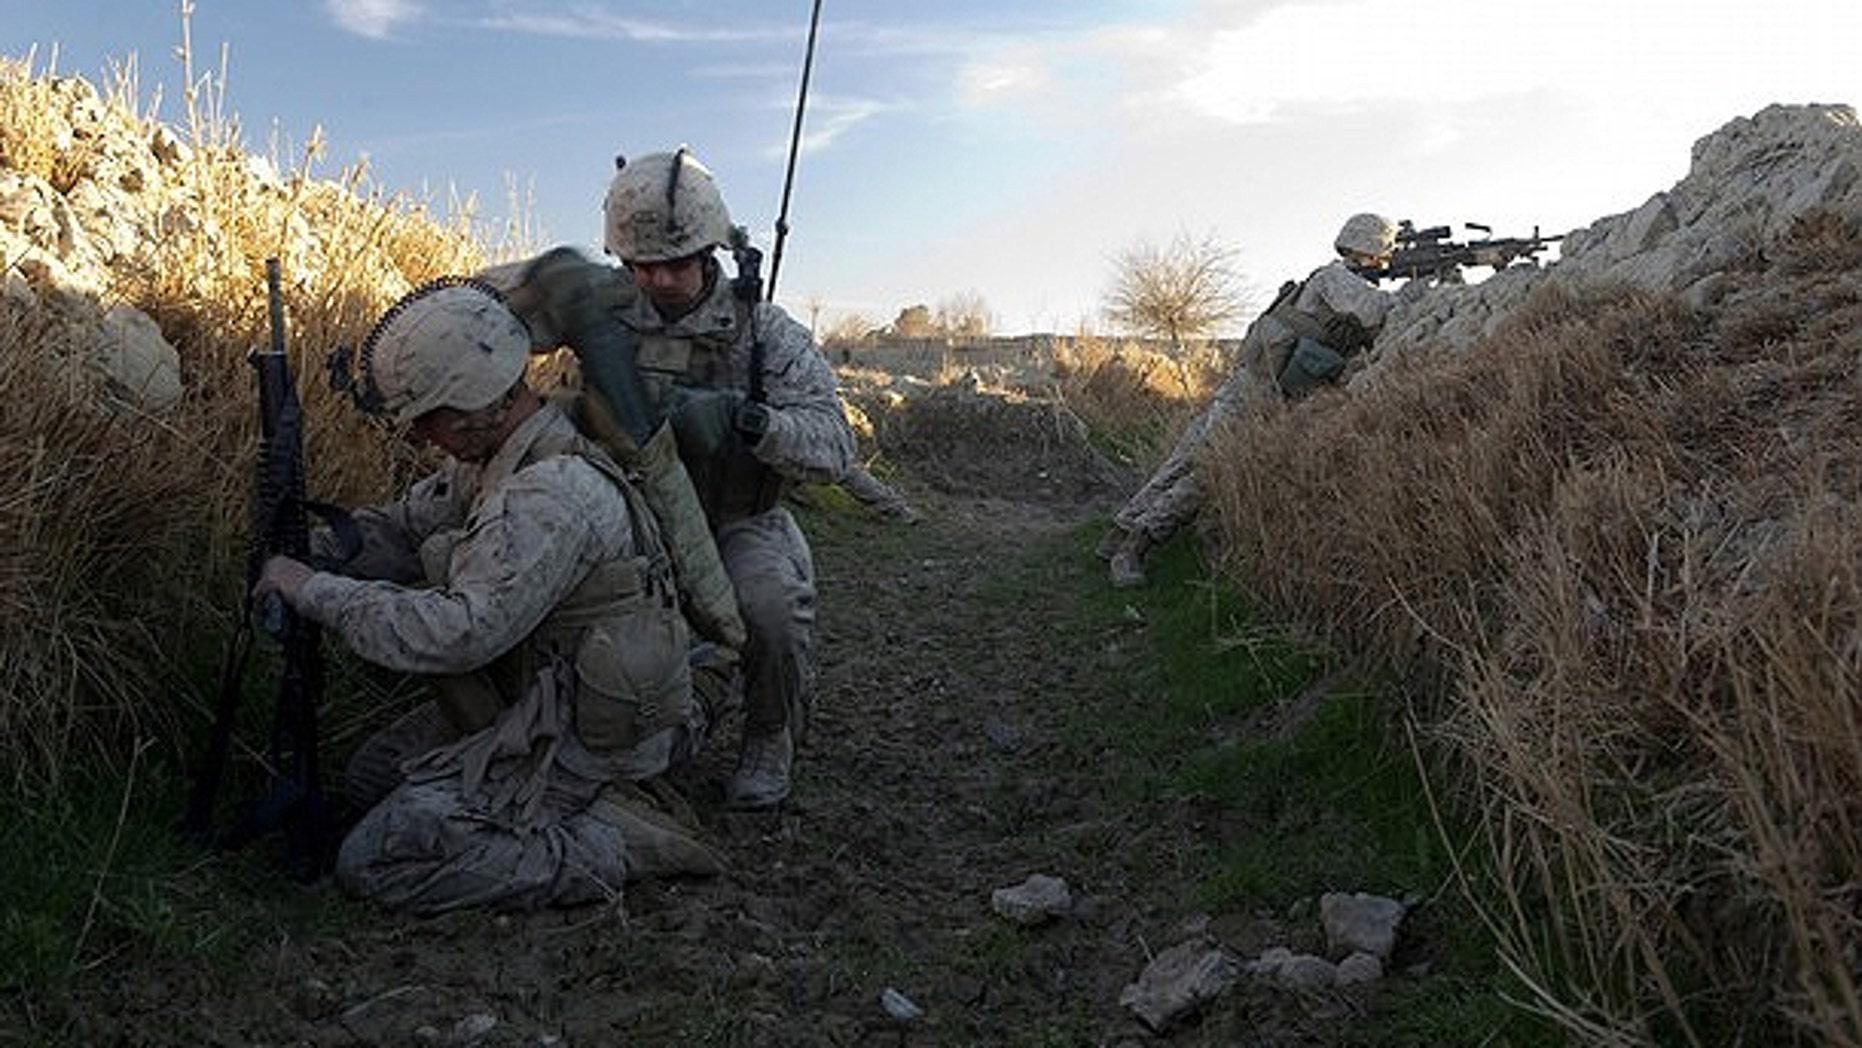 Feb. 8: U.S. Marines from 1st Battalion, 8th Marines, Bravo company patrol around Mirage patrol base, Musa Qala District, in Afghanistan's Helmand province.